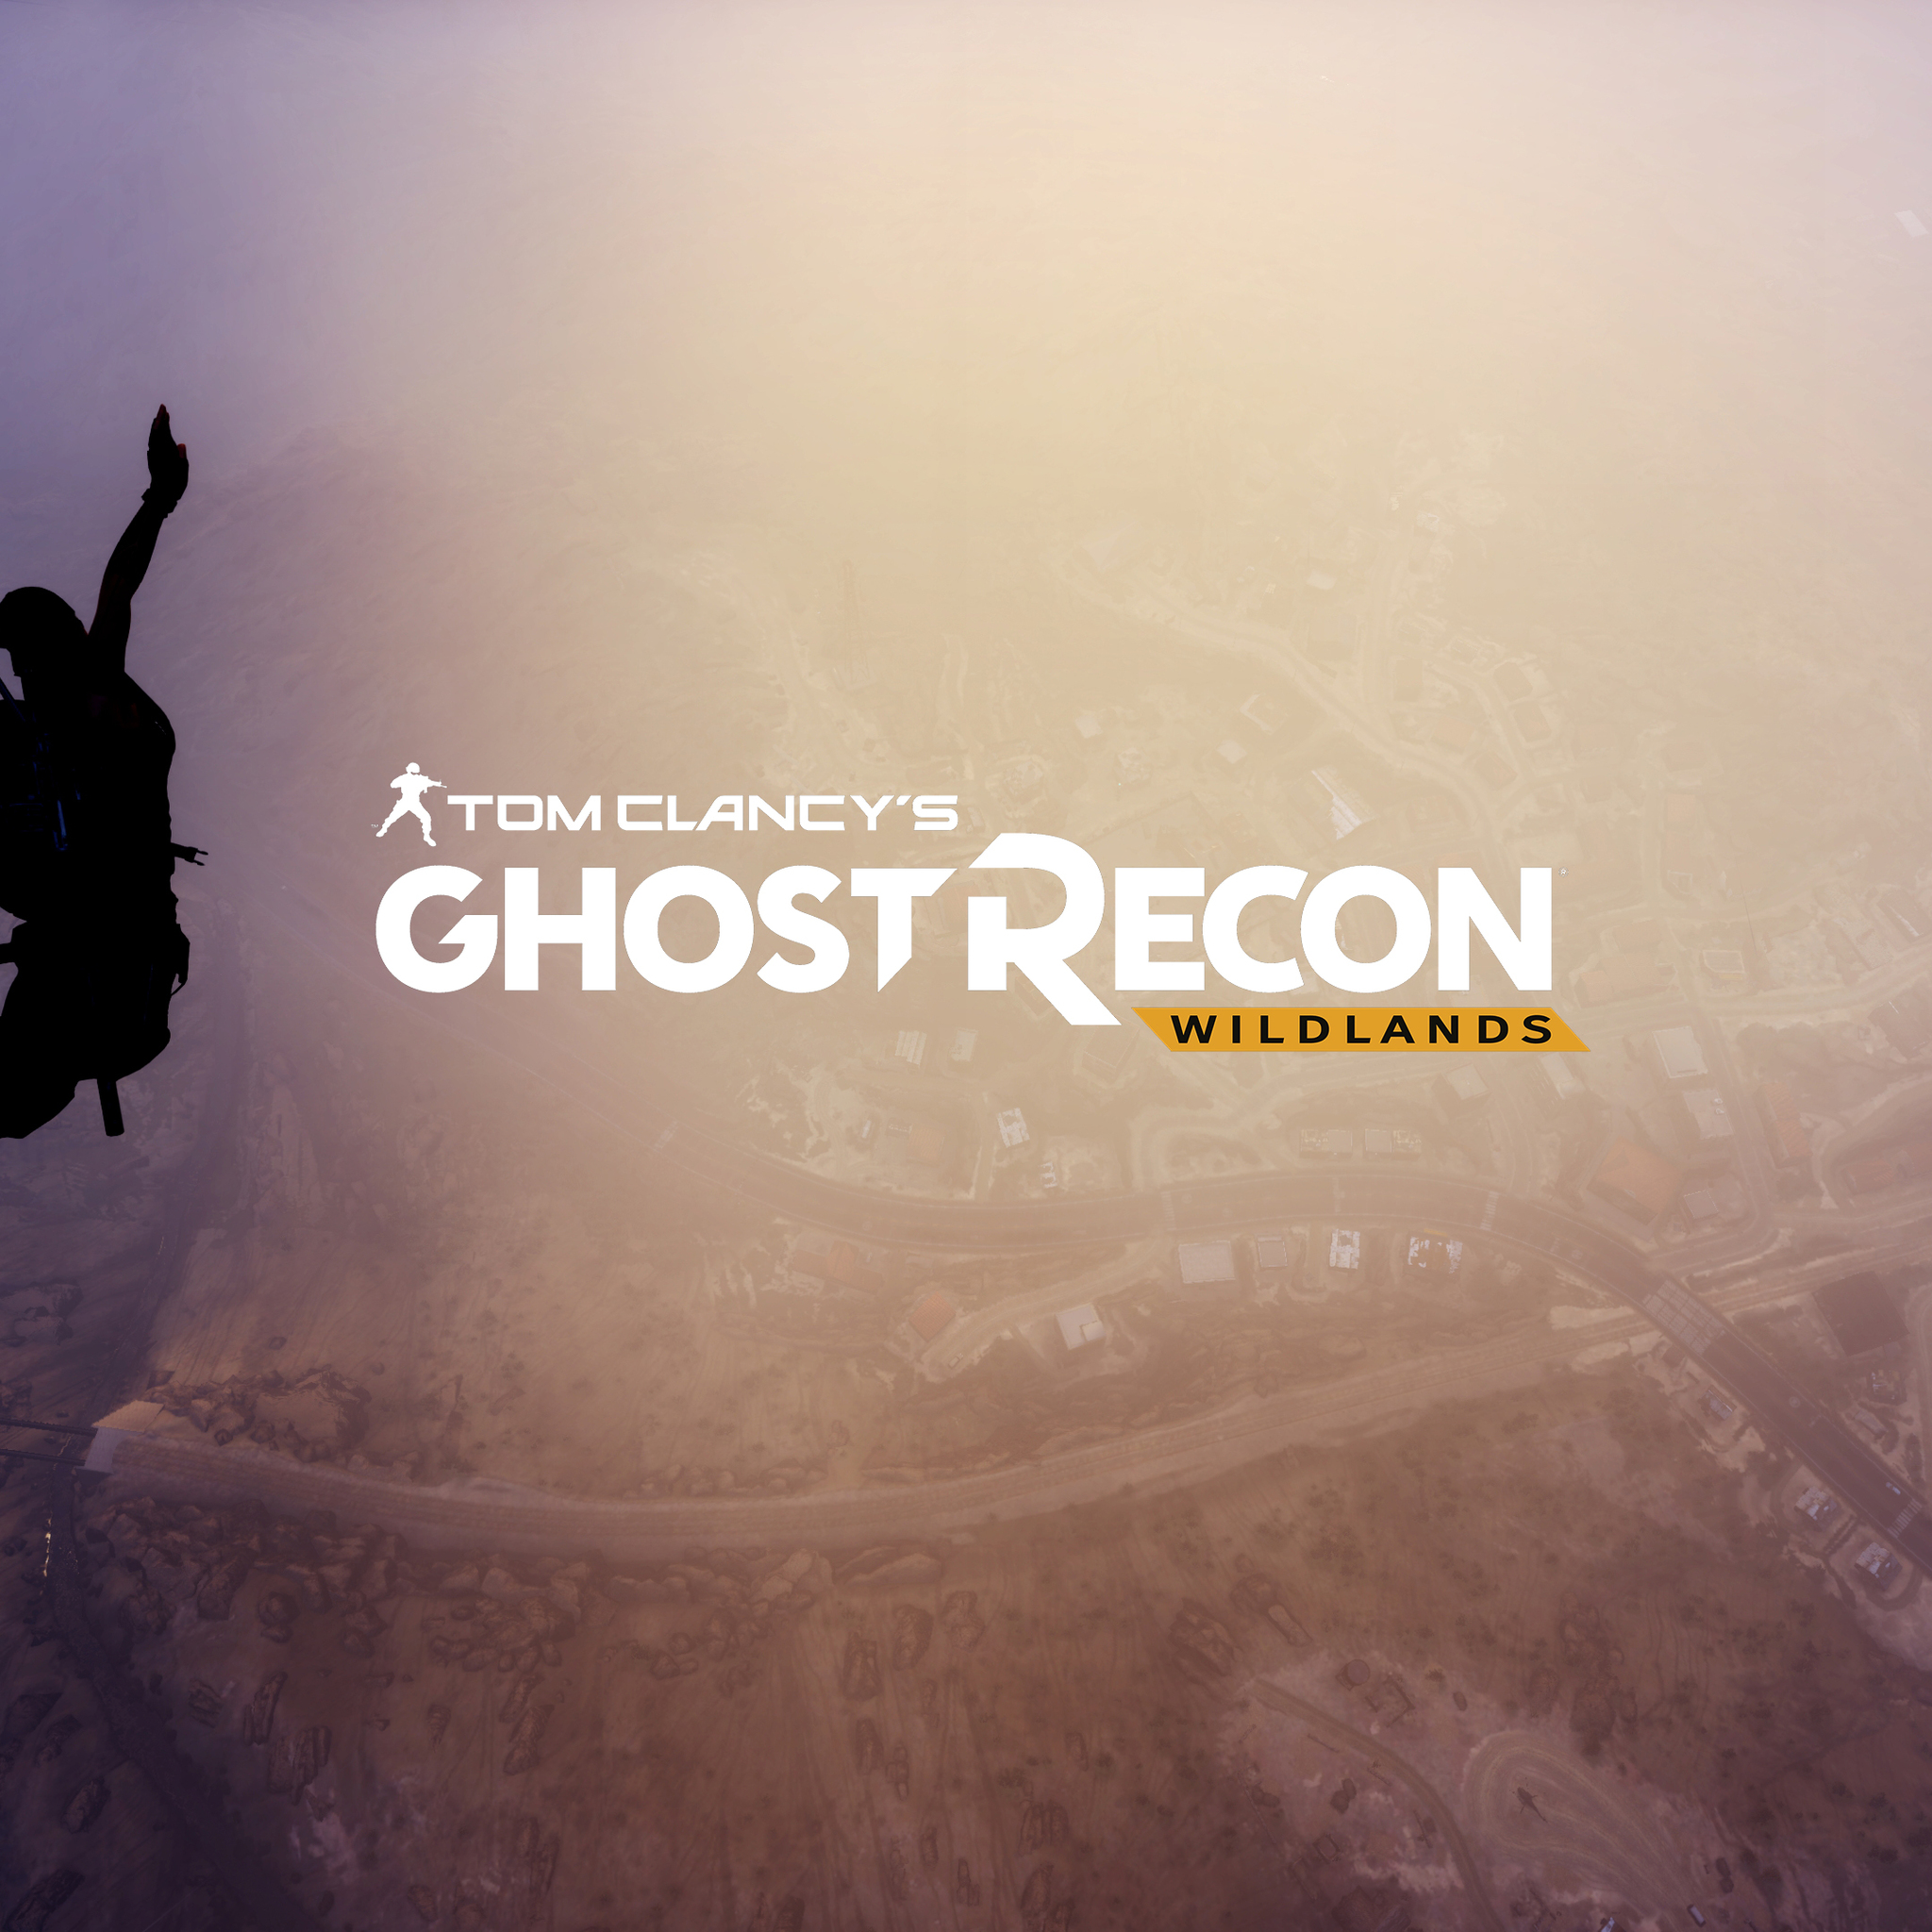 tom-clancys-ghost-recon-wildlands-4k-logo-04.jpg